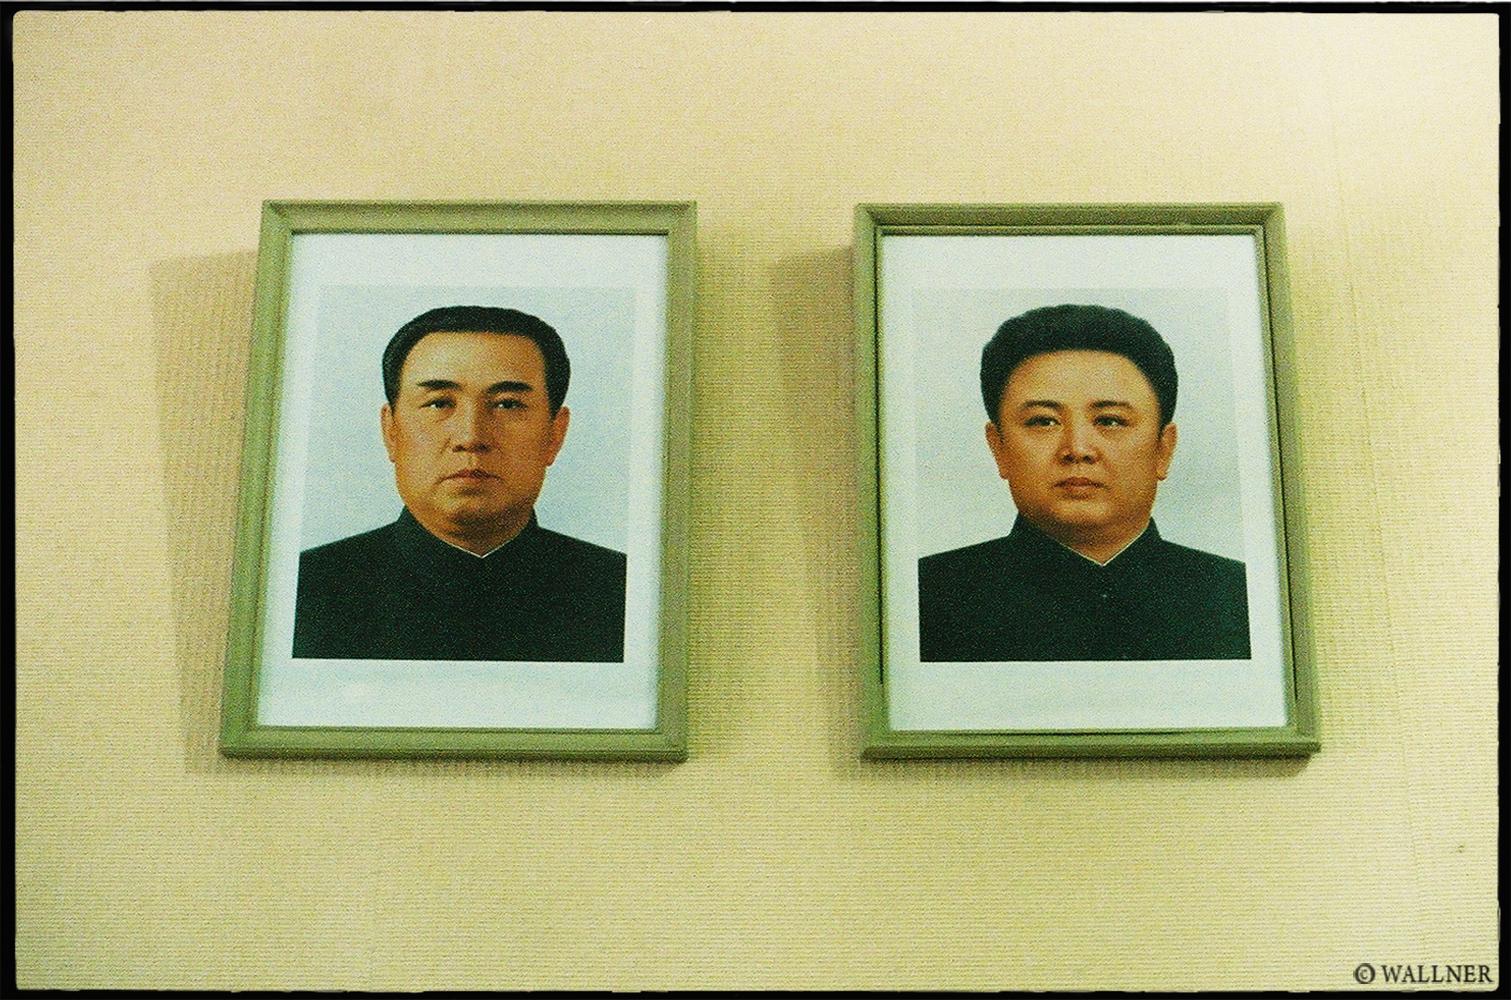 35mmPatrikWallner_Pyongyang_TheKimsLOWQ